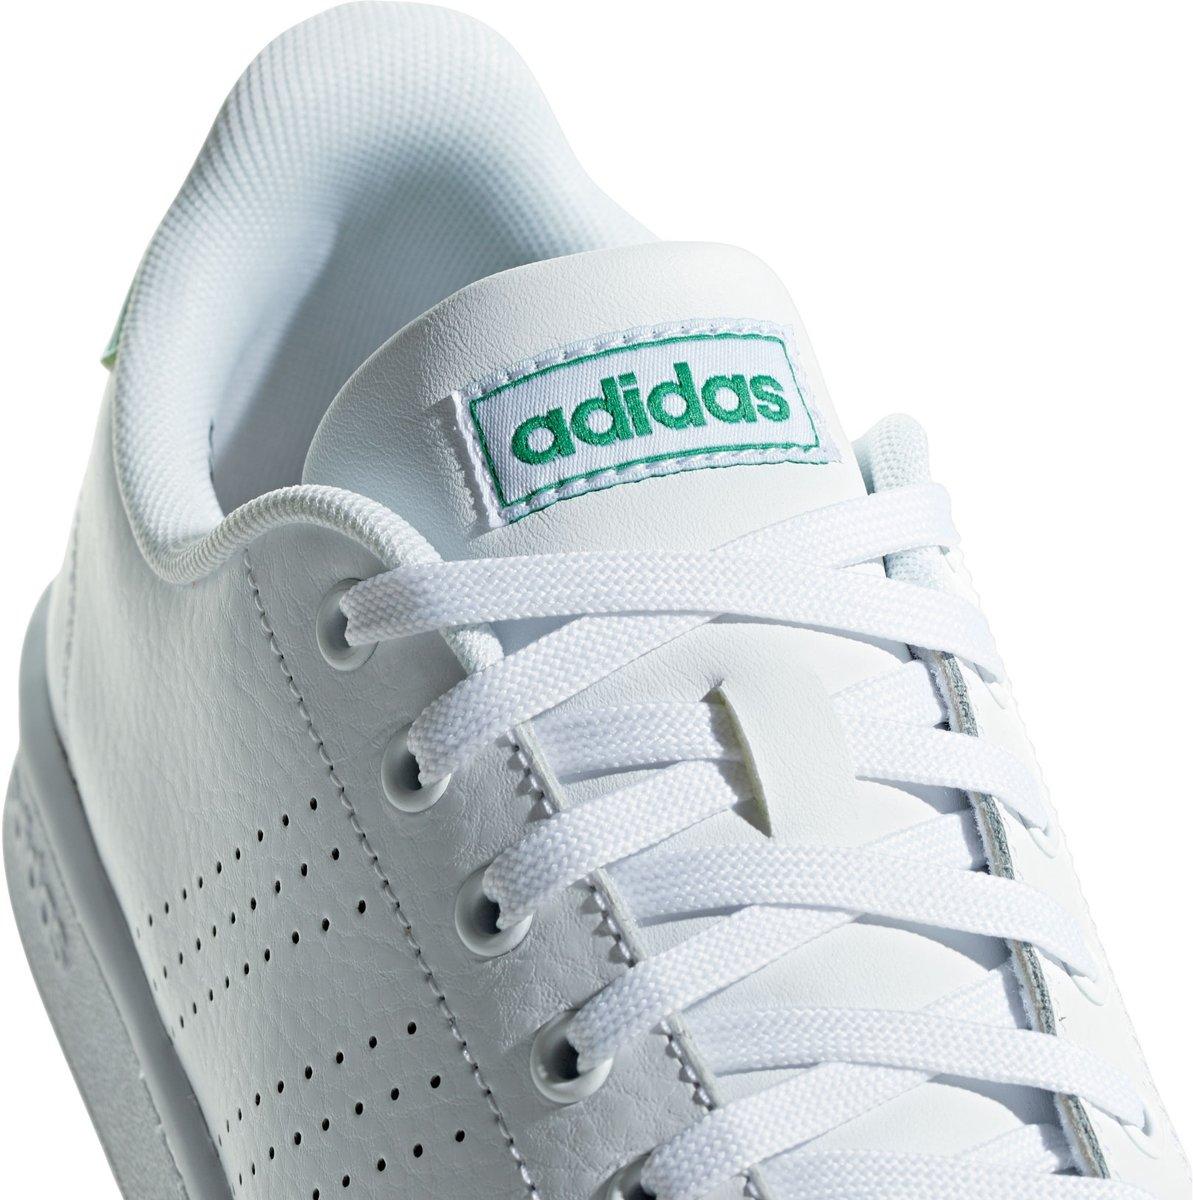 adidas Advantage Sportschoenen Maat 38 23 Unisex witgroen